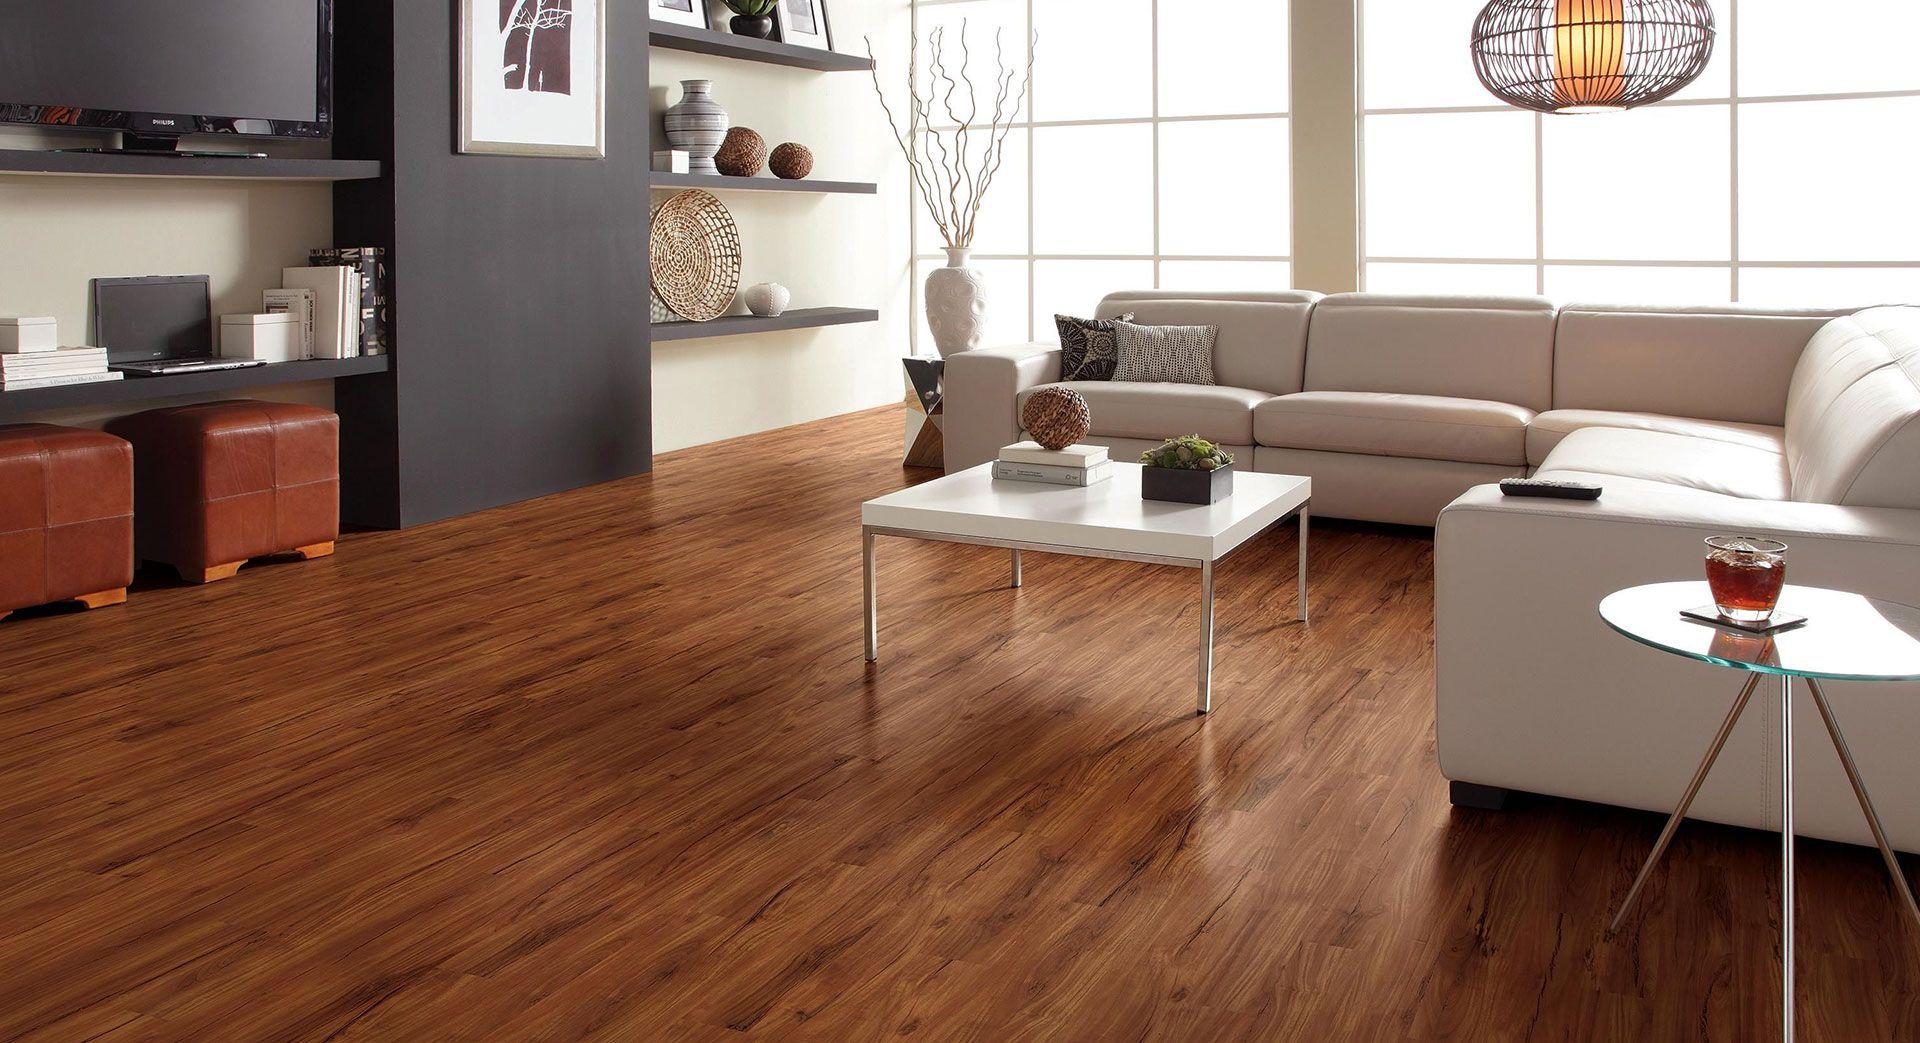 sci michigan flooring commercial floors sheet vinyl your inc wood provider